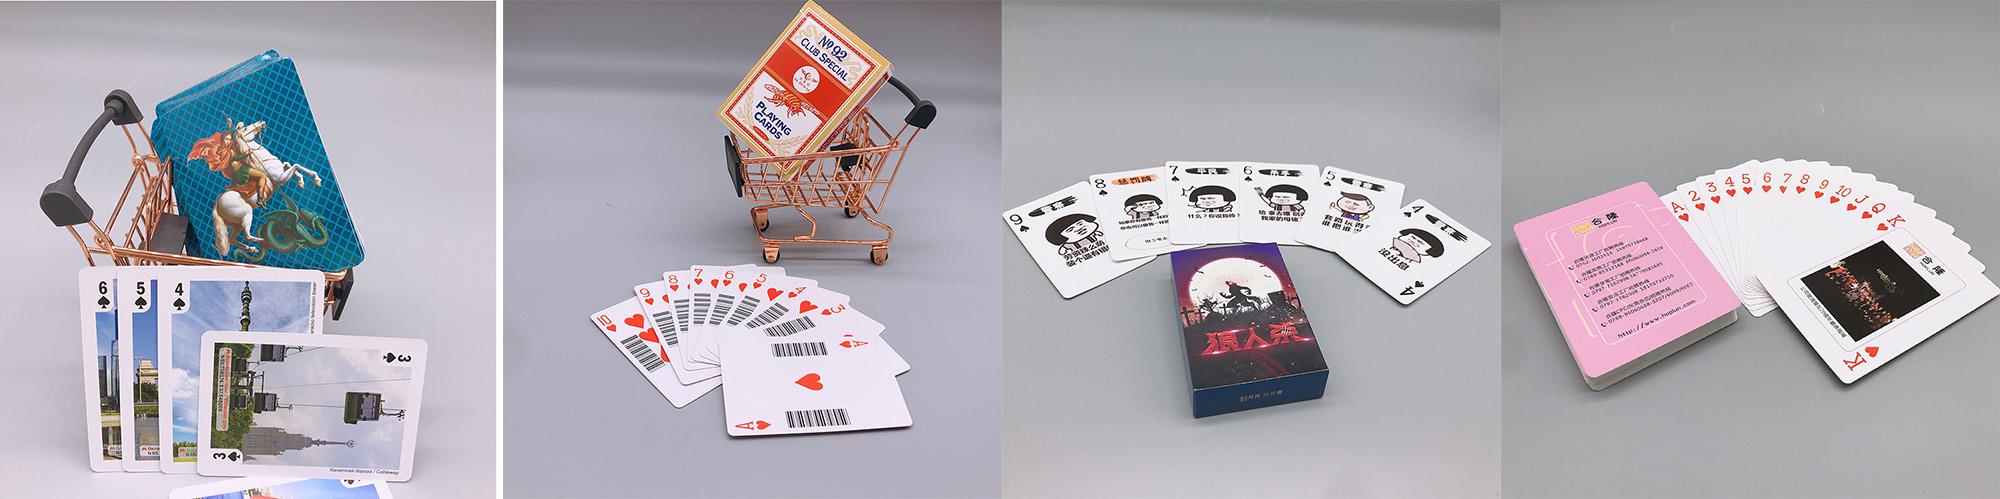 Custom German Blackcore Paper Poker 63 88 Mm Matt Gloss Vanishing Playing Card For Casino Buy German Blackcore Paper Poker Playing Card For Casino Custom Poker Card Product On Alibaba Com